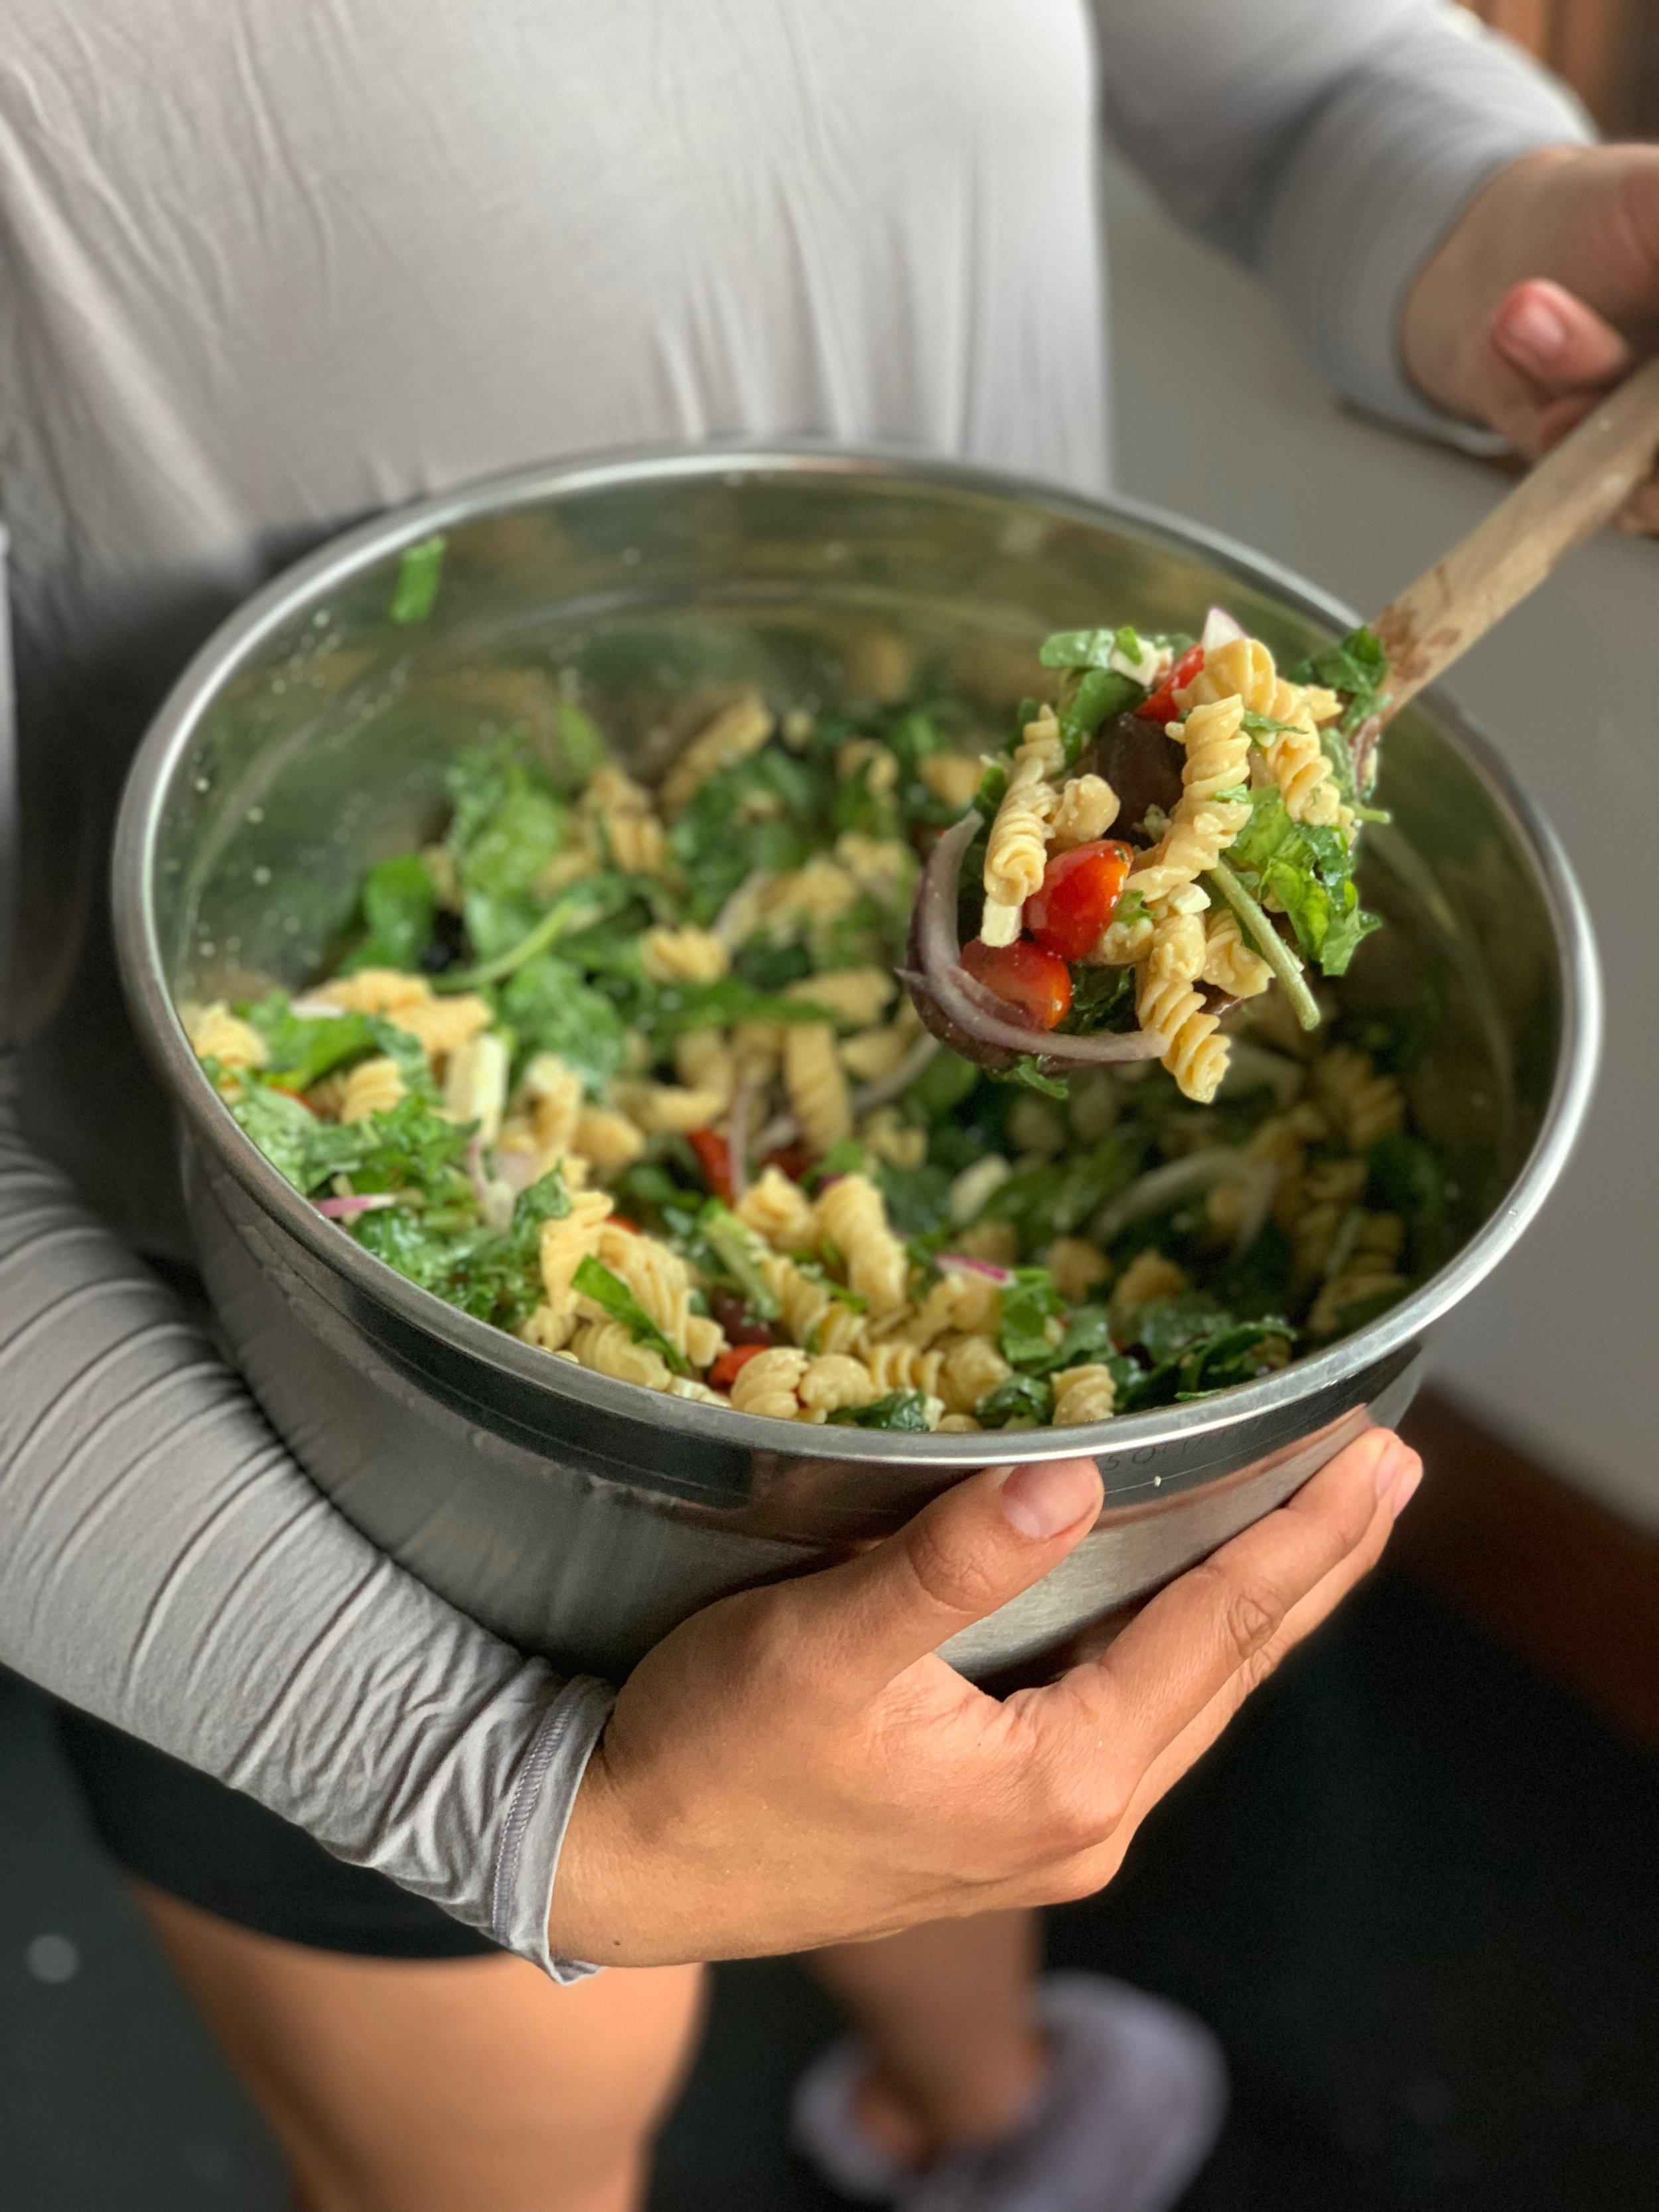 #4: Eating Greens Everyday